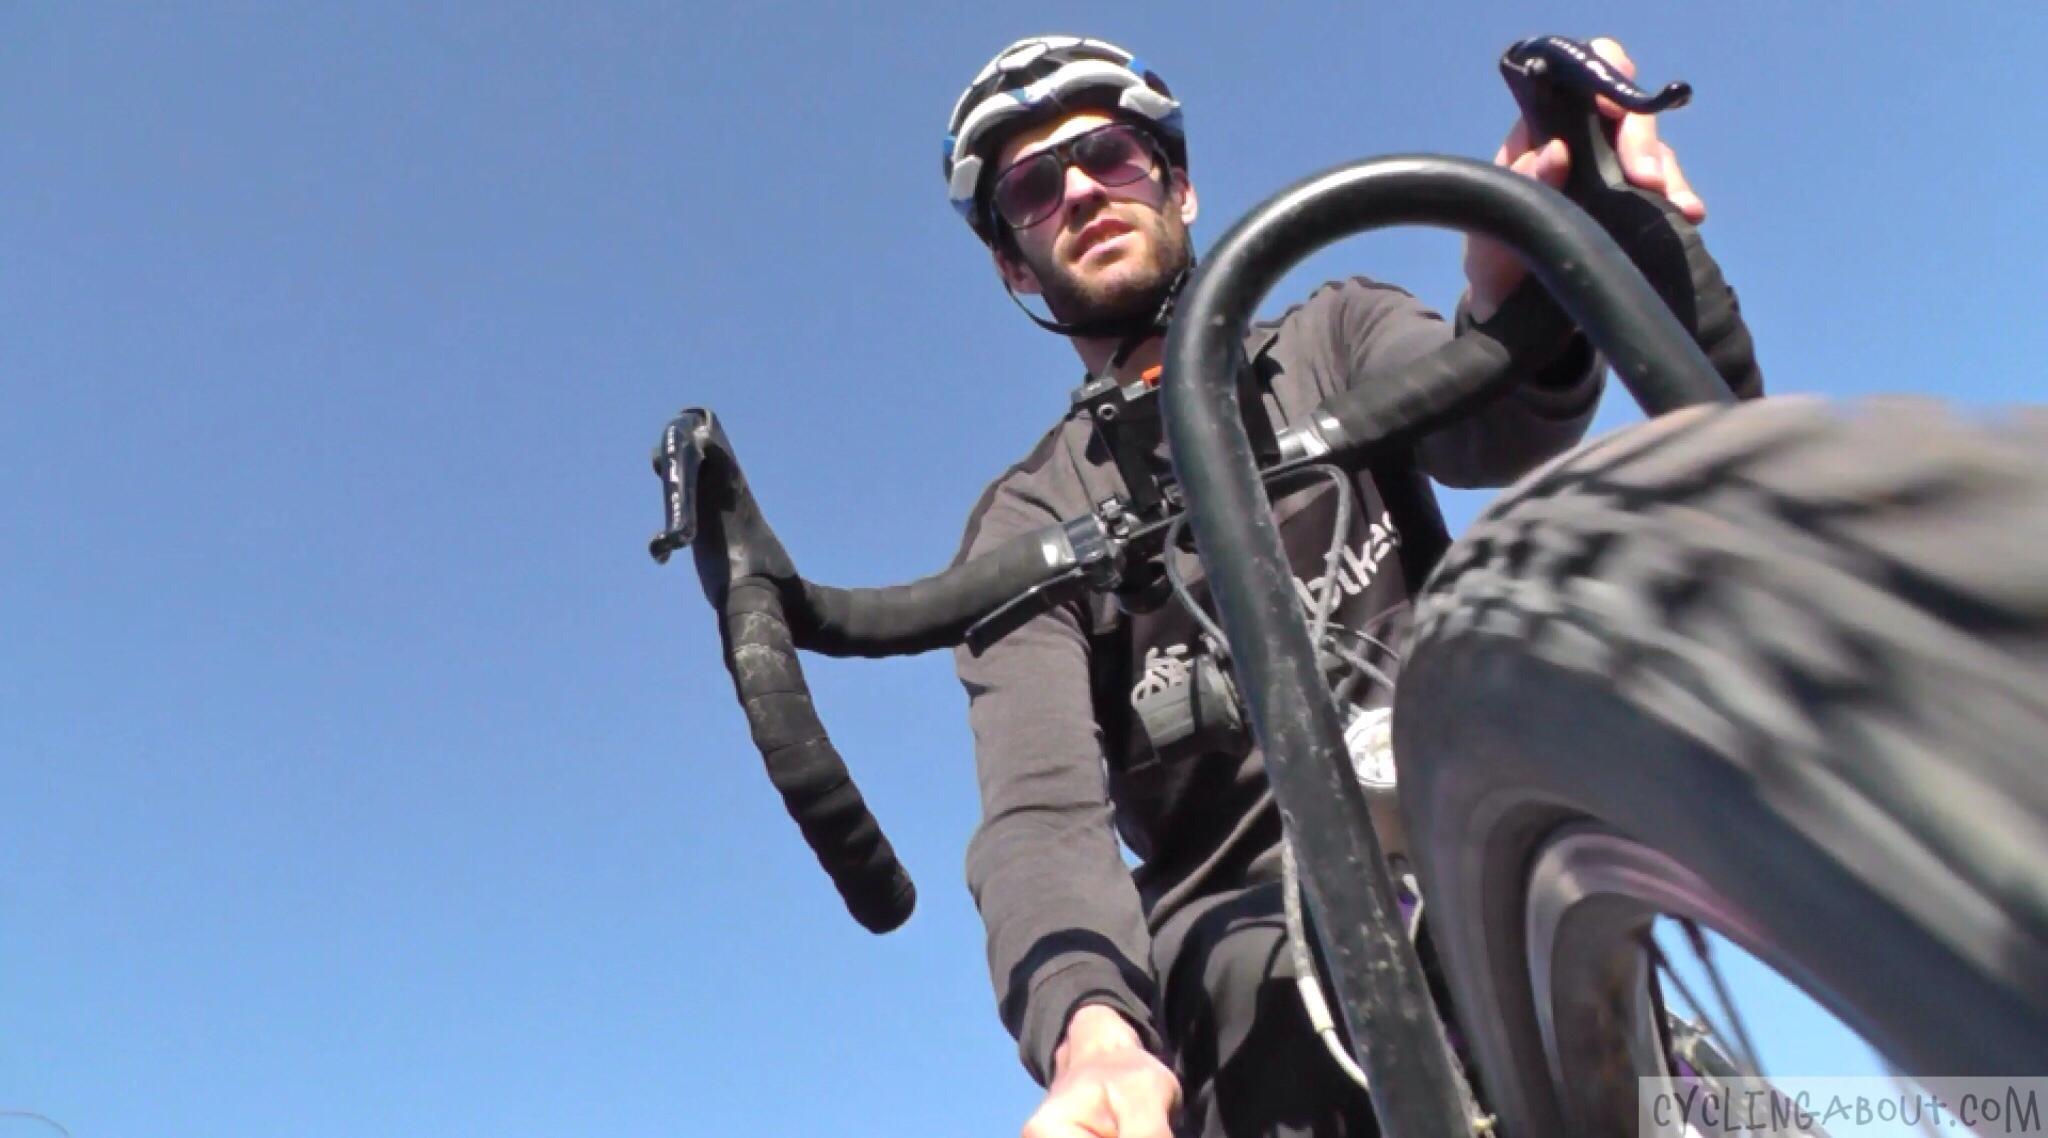 Handlebars for Tandem Bikes